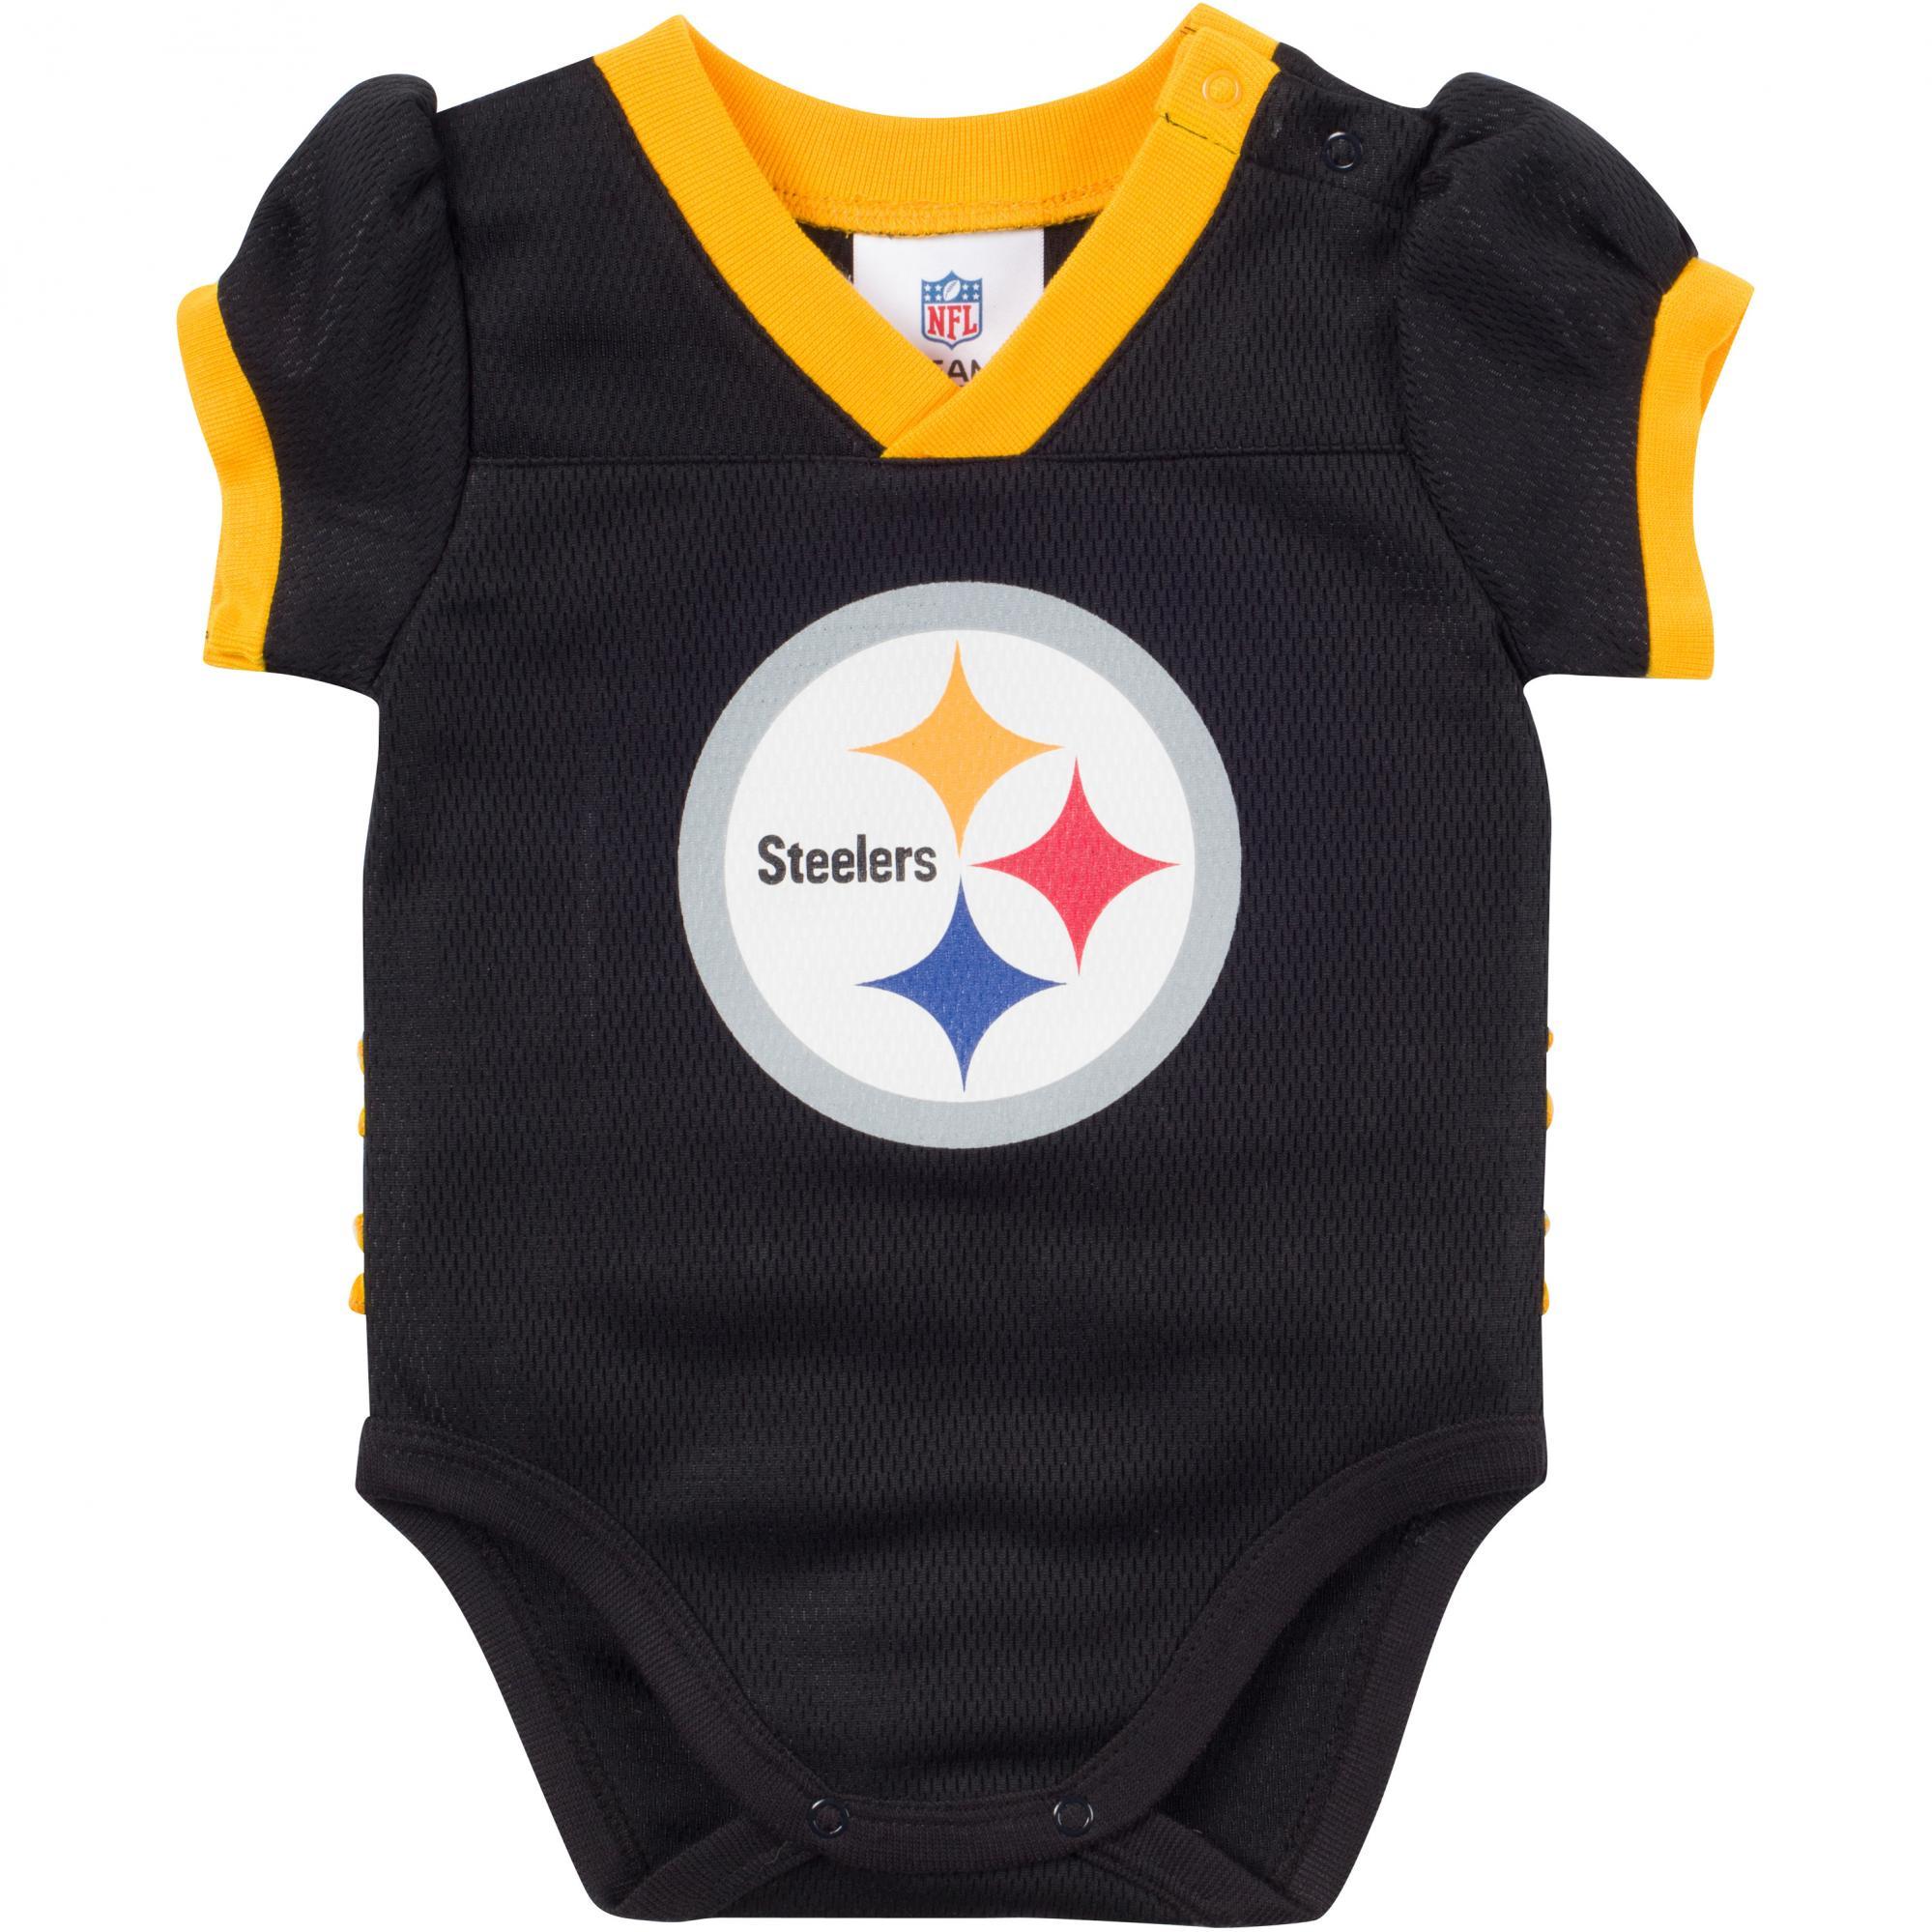 steelers-baby-rufflebutt-player-jersey-bodysuit-1680.jpg